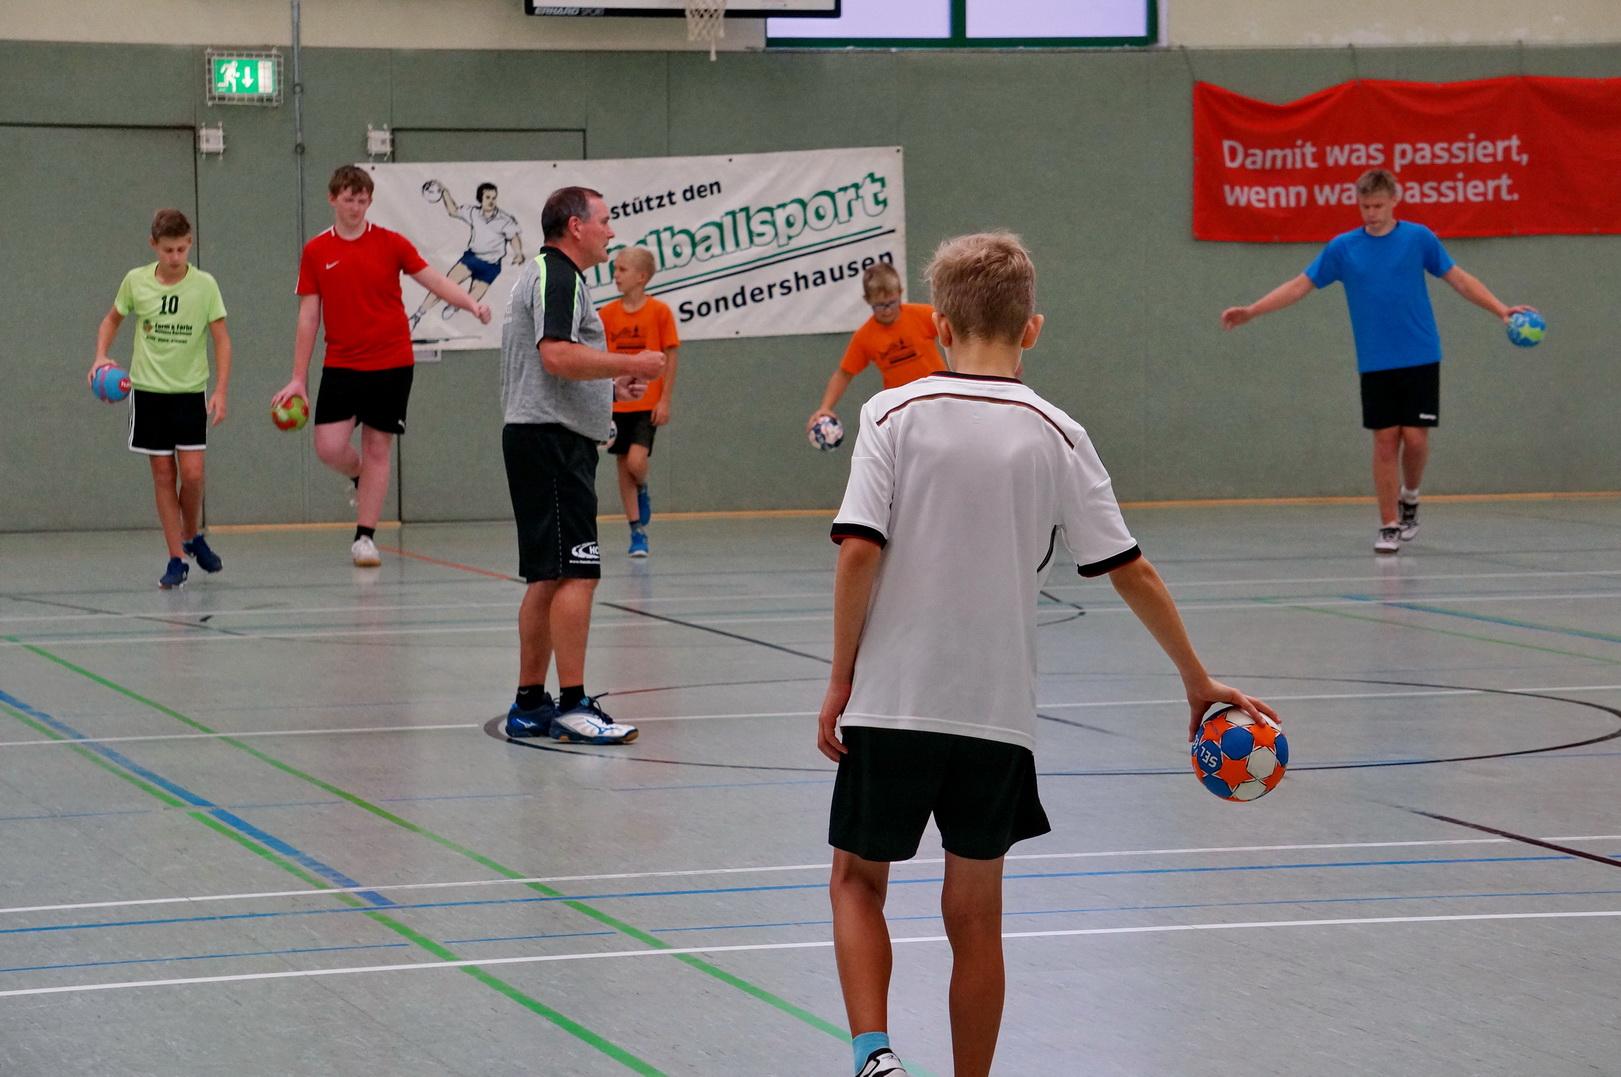 201808_Handballcamp_SDH_MG_059w